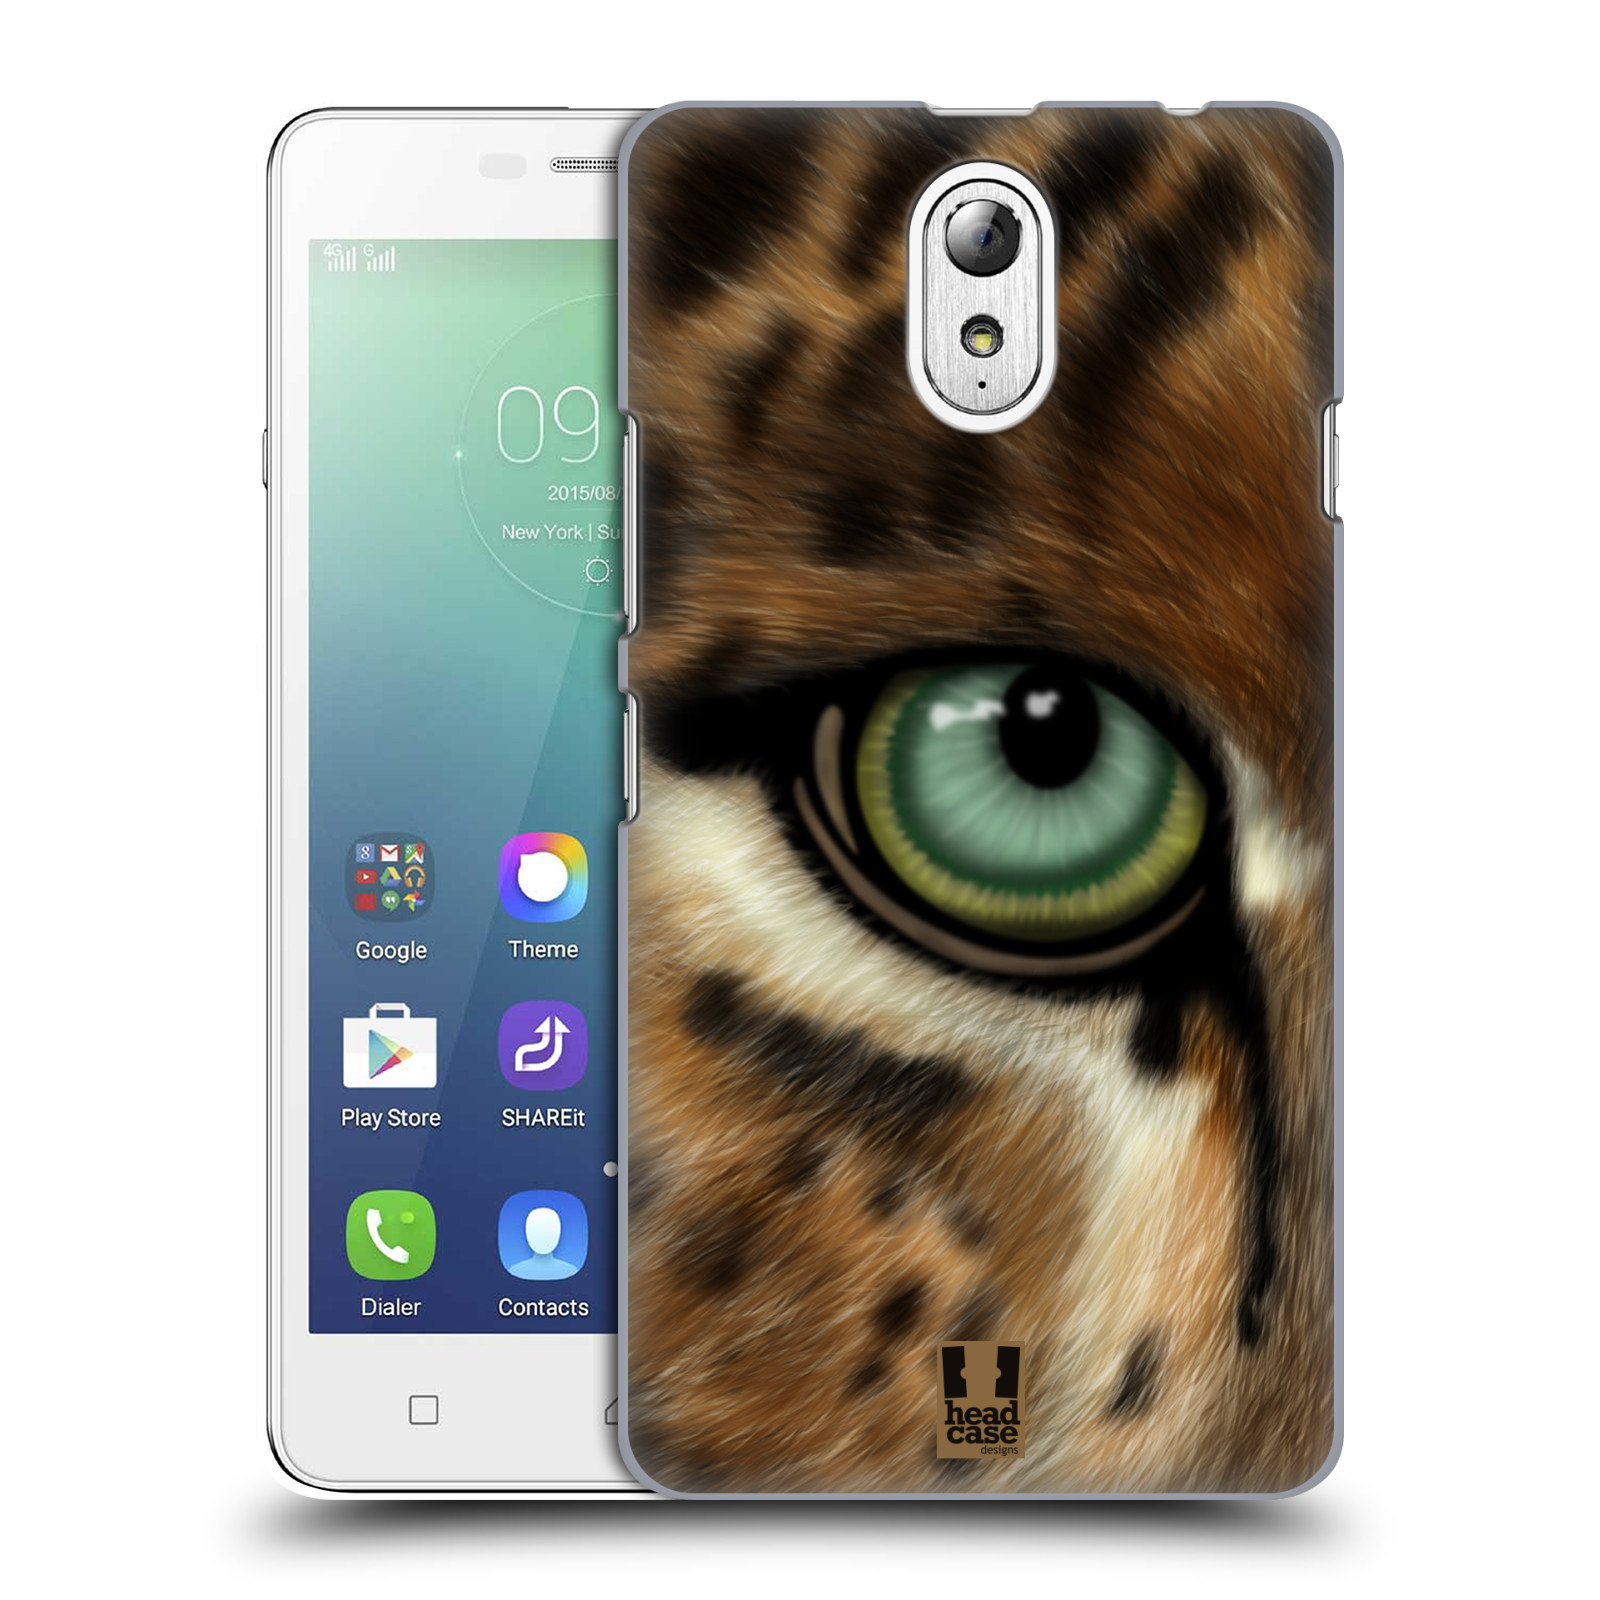 HEAD CASE pevný plastový obal na mobil LENOVO VIBE P1m / LENOVO VIBE p1m DUAL SIM vzor pohled zvířete oko leopard